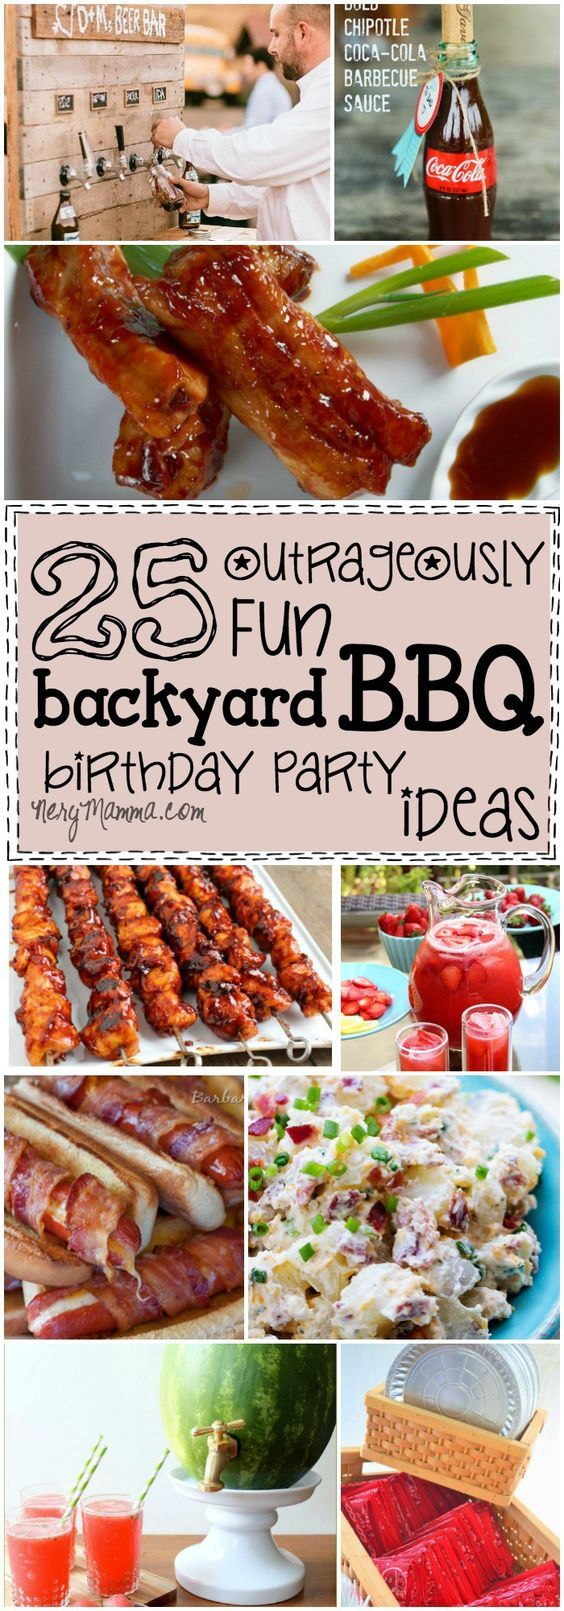 Fun Backyard Bbq Ideas : These 25 Outrageously Fun Backyard BBQ Birthday Party ideas are so fun